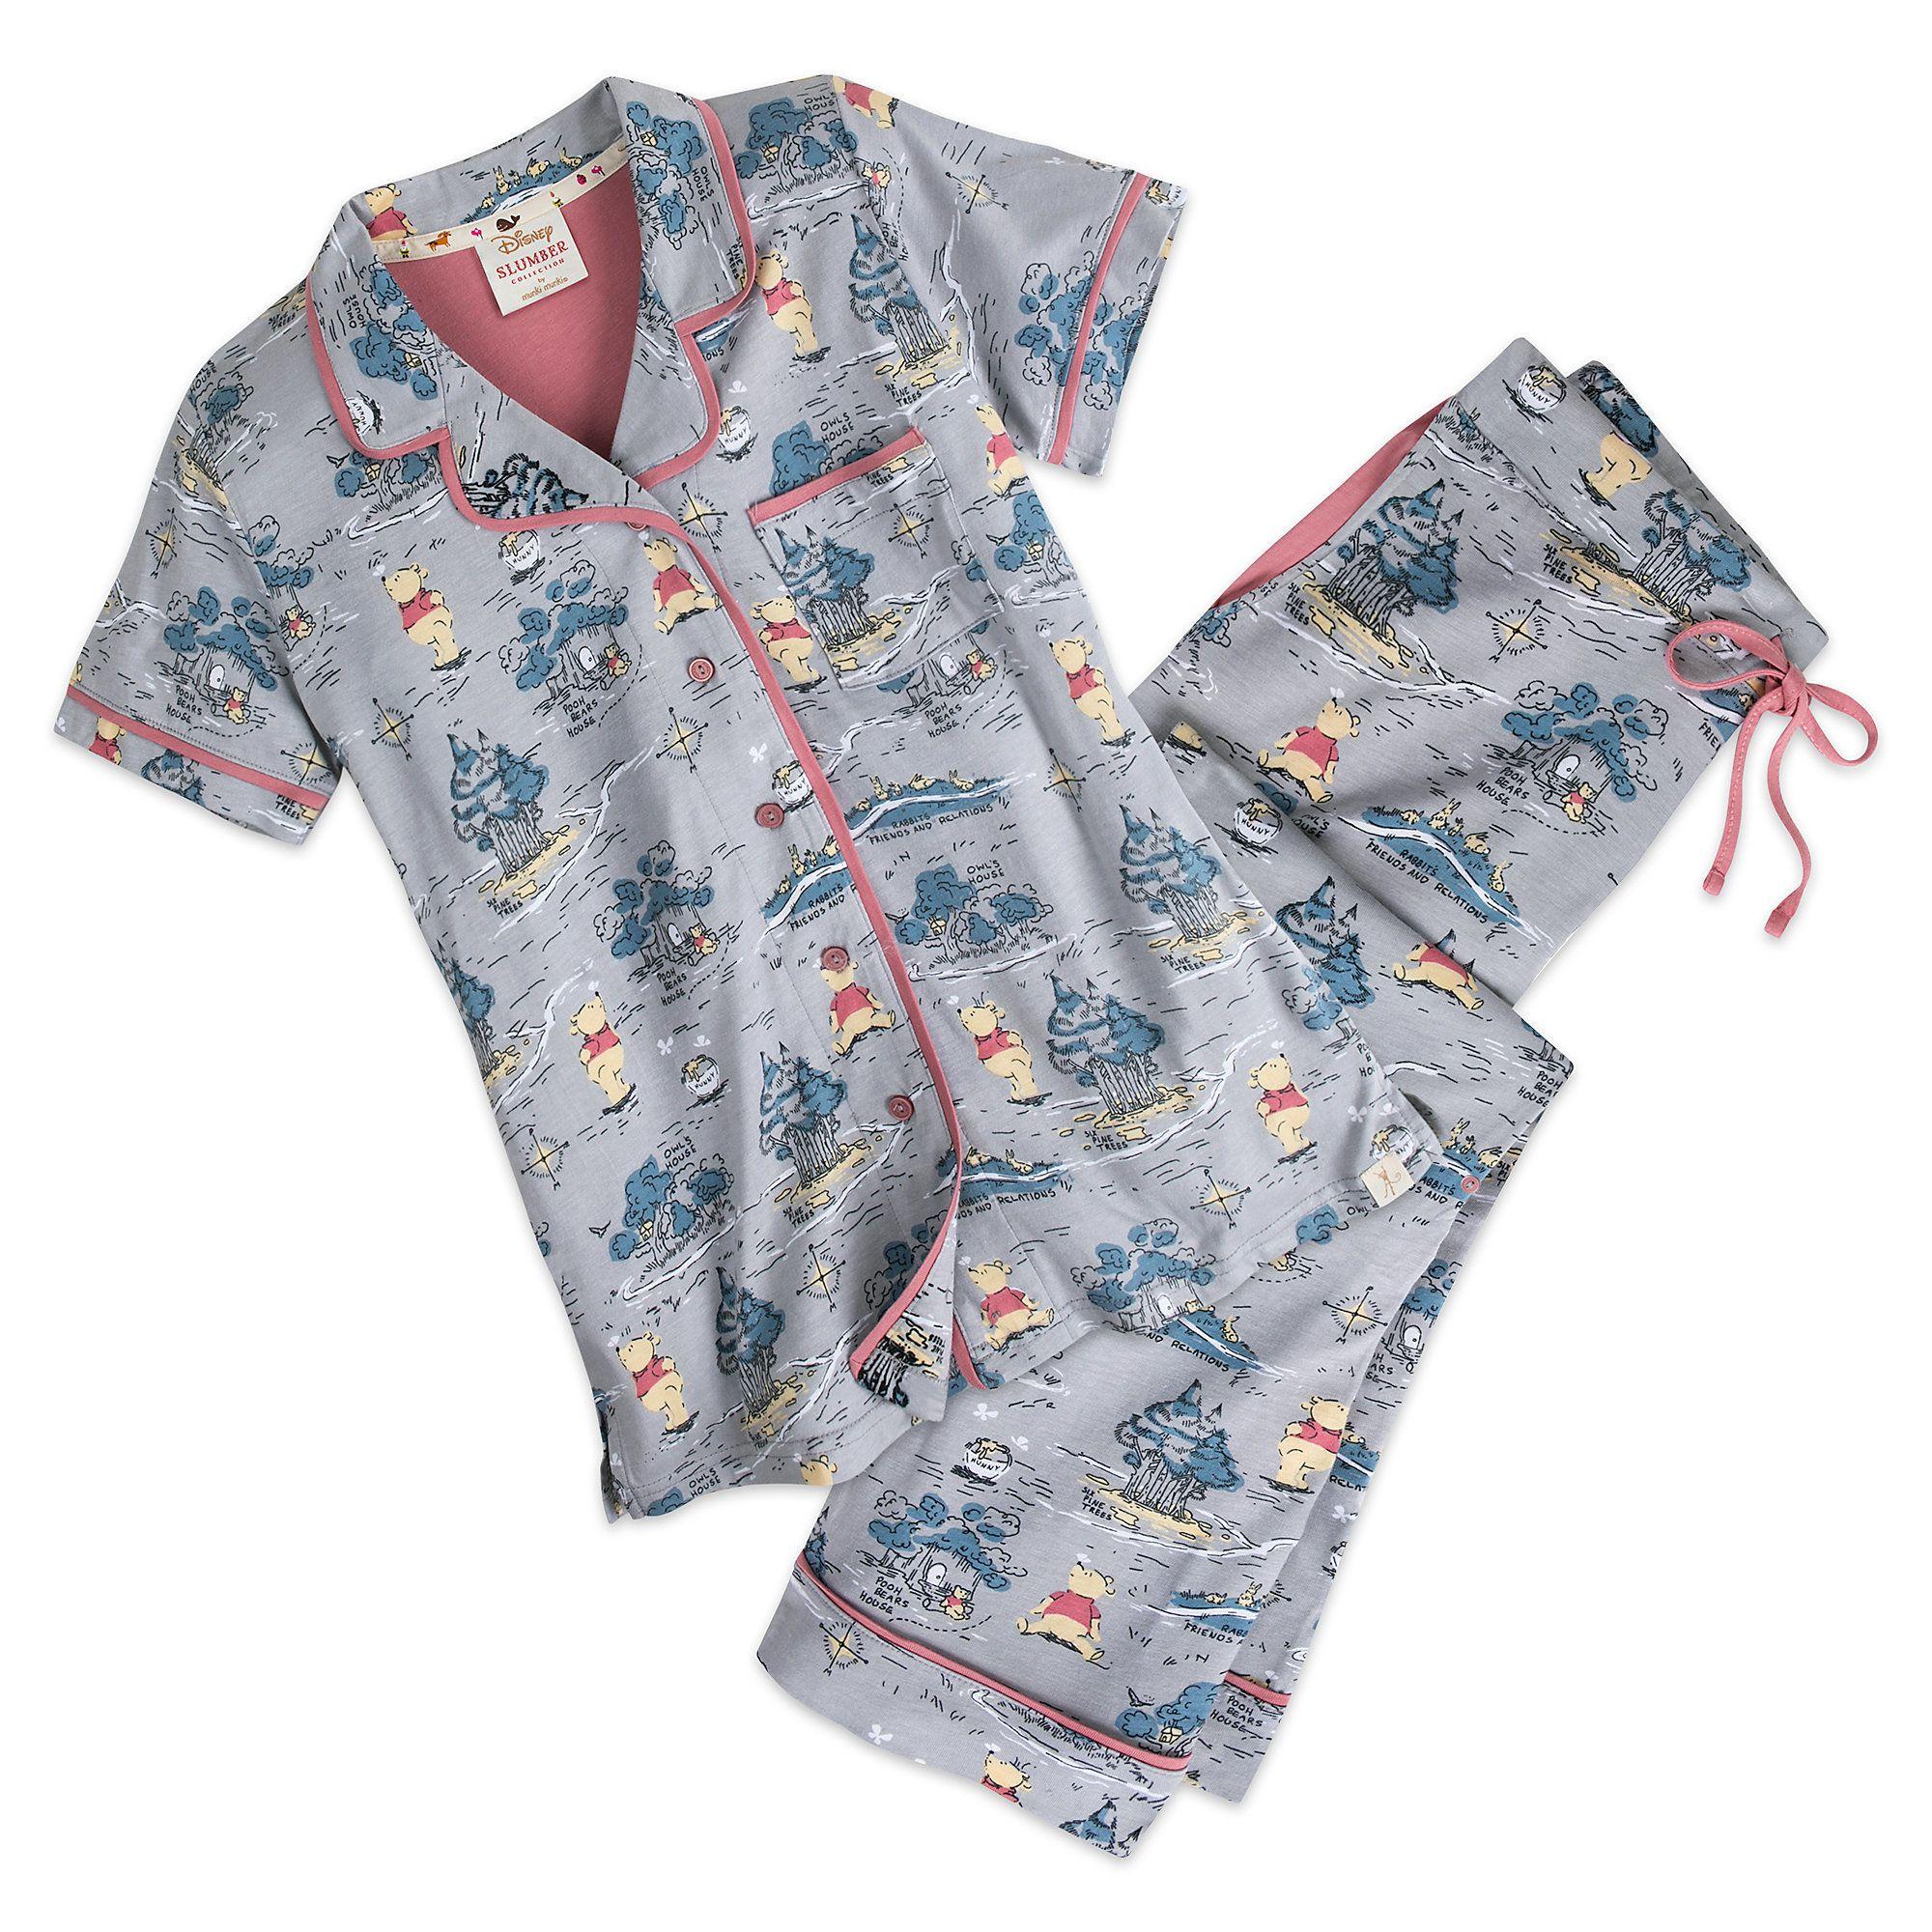 Winnie the Pooh Knit Pajama Set for Women by Munki Munki®  3628c2bda